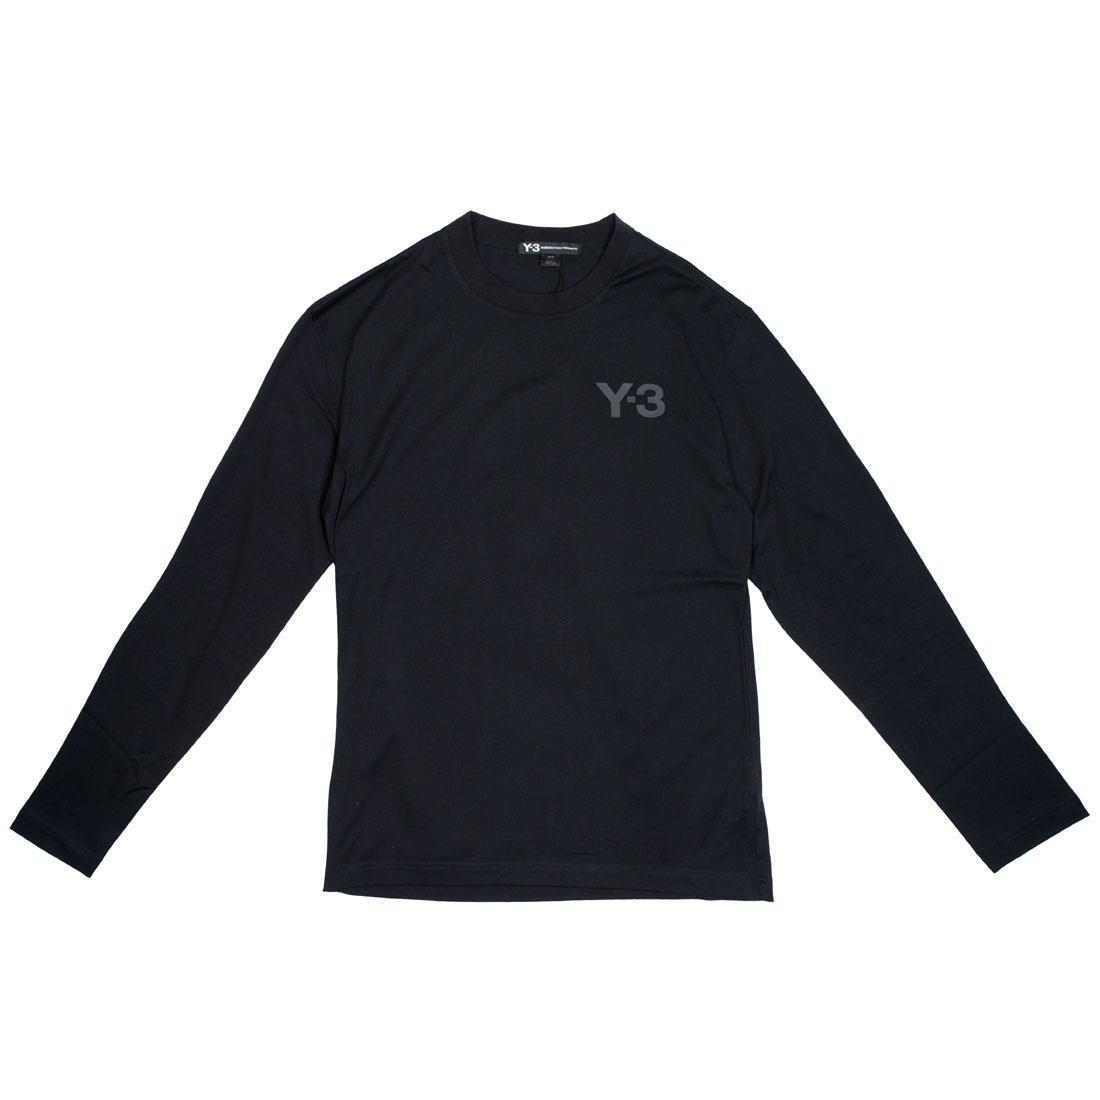 Adidas Y-3 Men Logo Long Sleeve Tee (black)